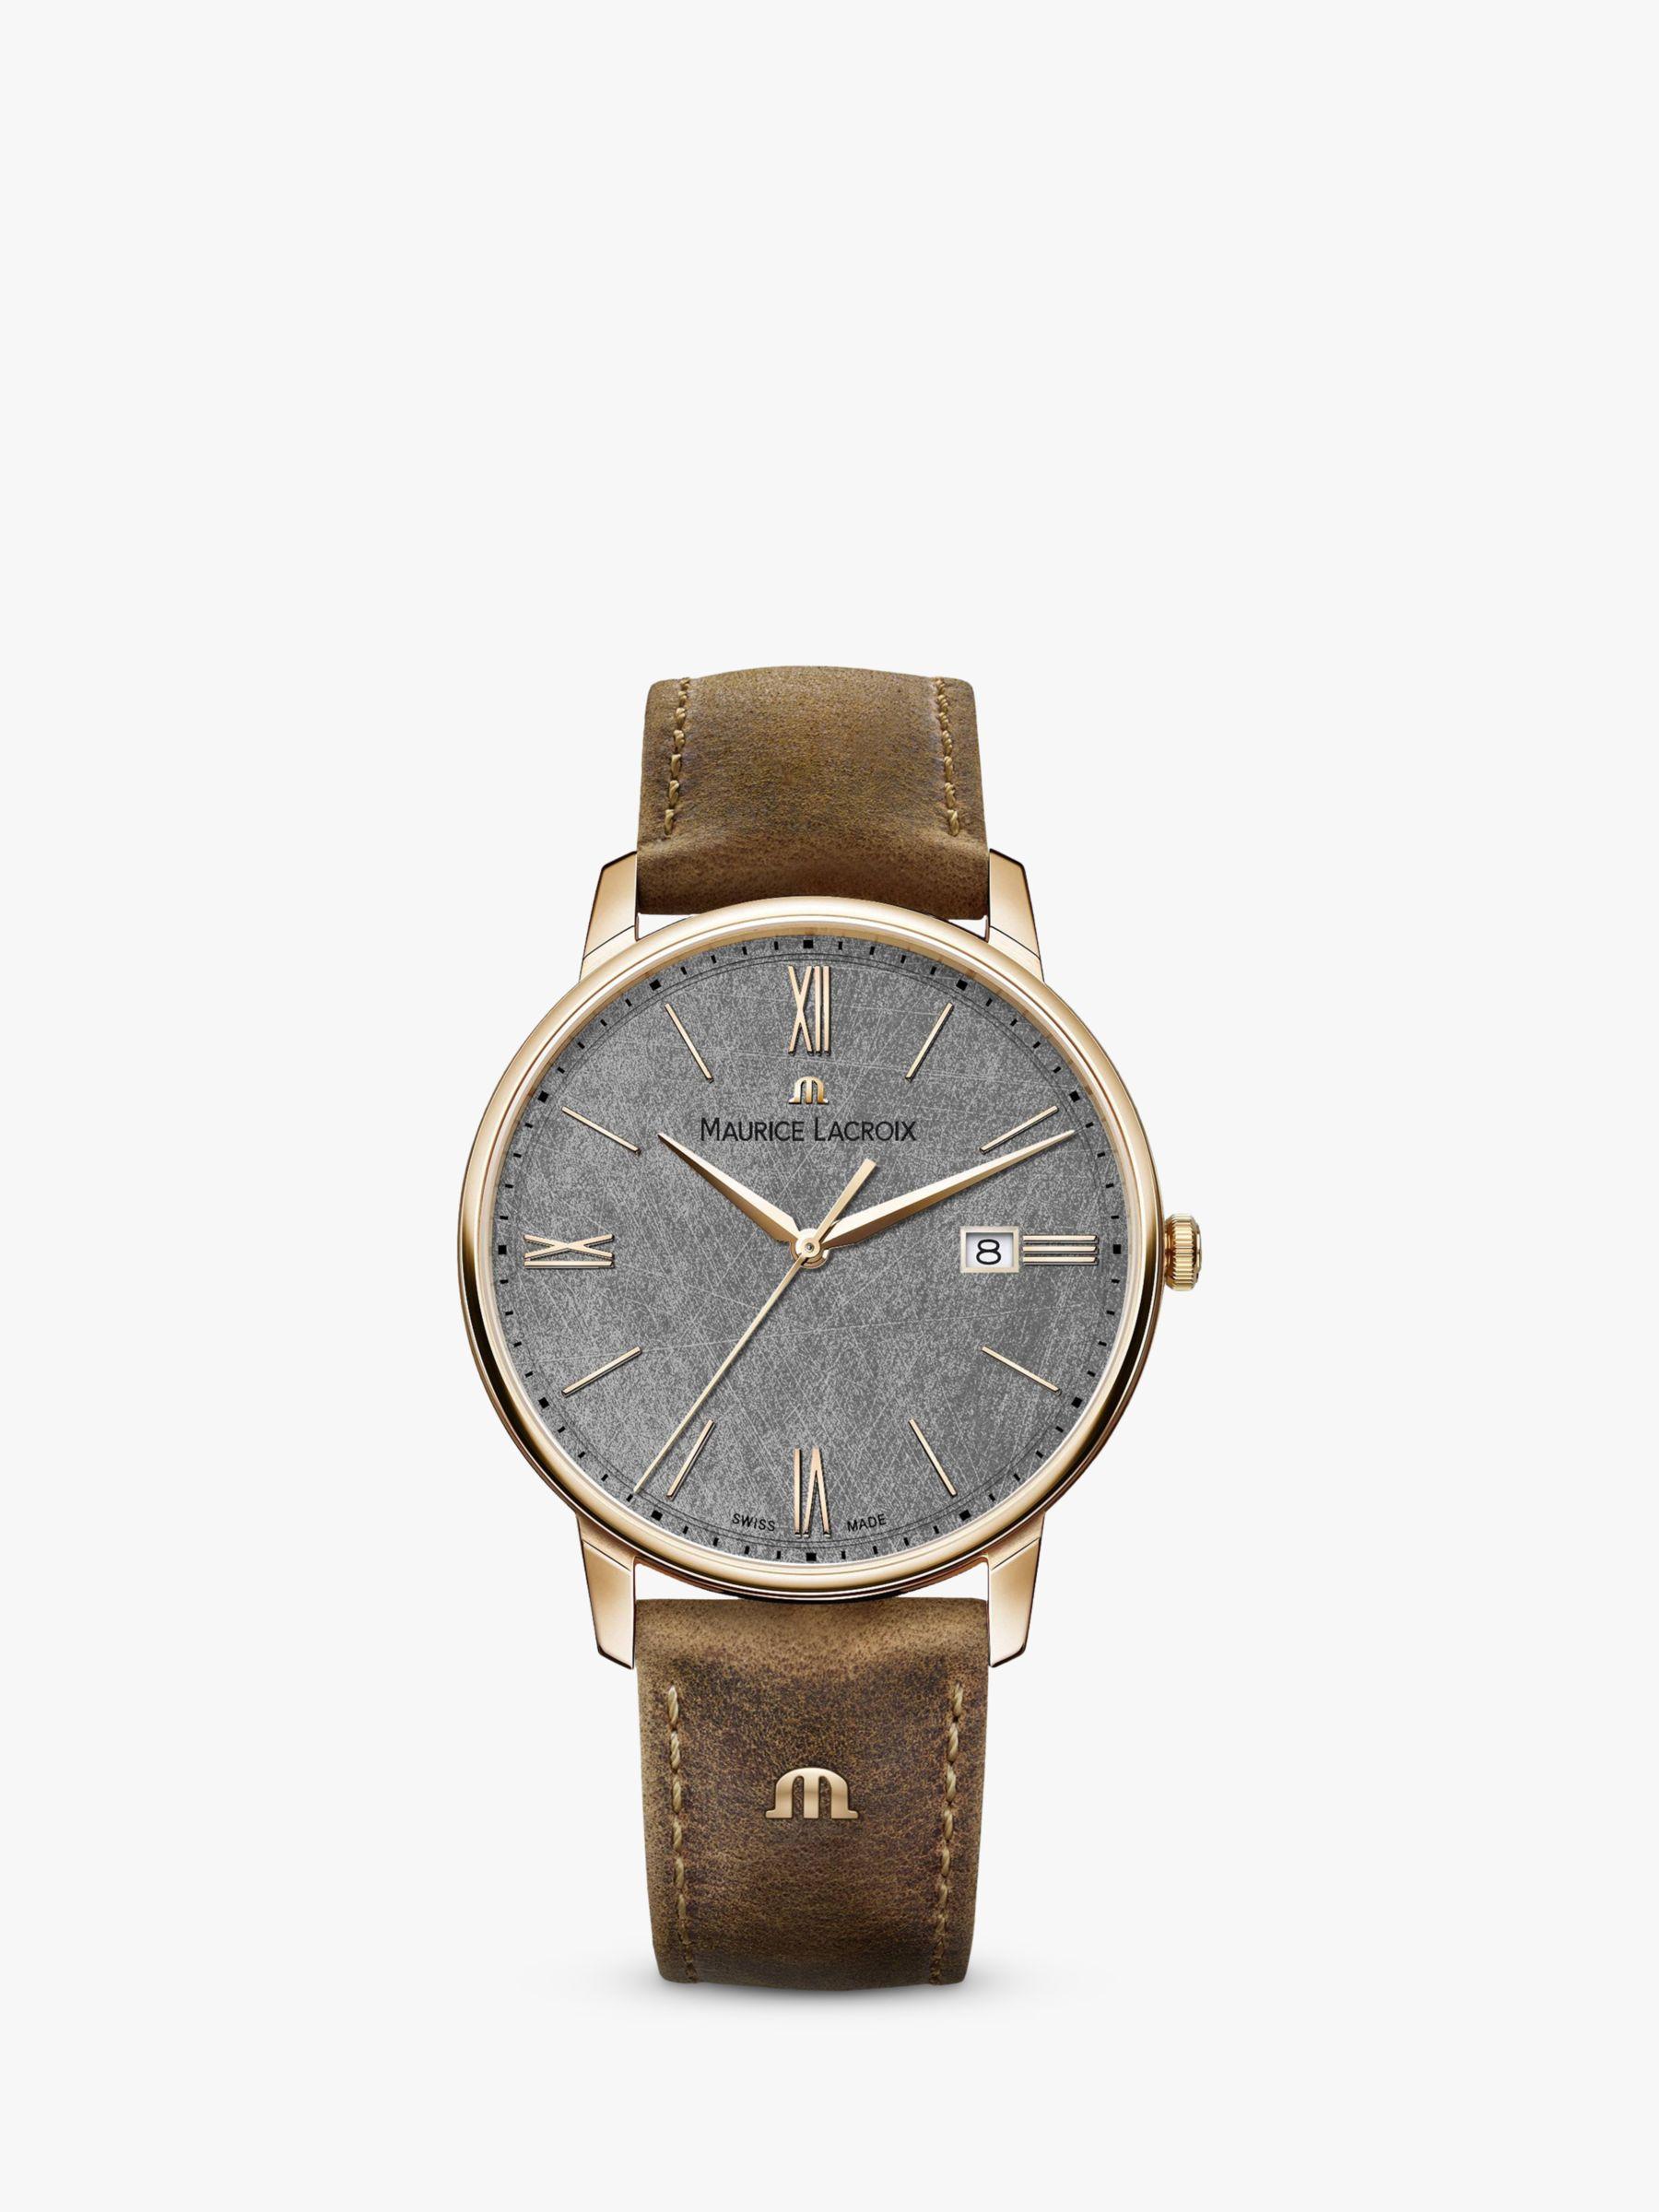 Maurice Lacroix Maurice Lacroix EL1118-PVP01-210-1 Men's Eliros Date Leather Strap Watch, Brown/Grey